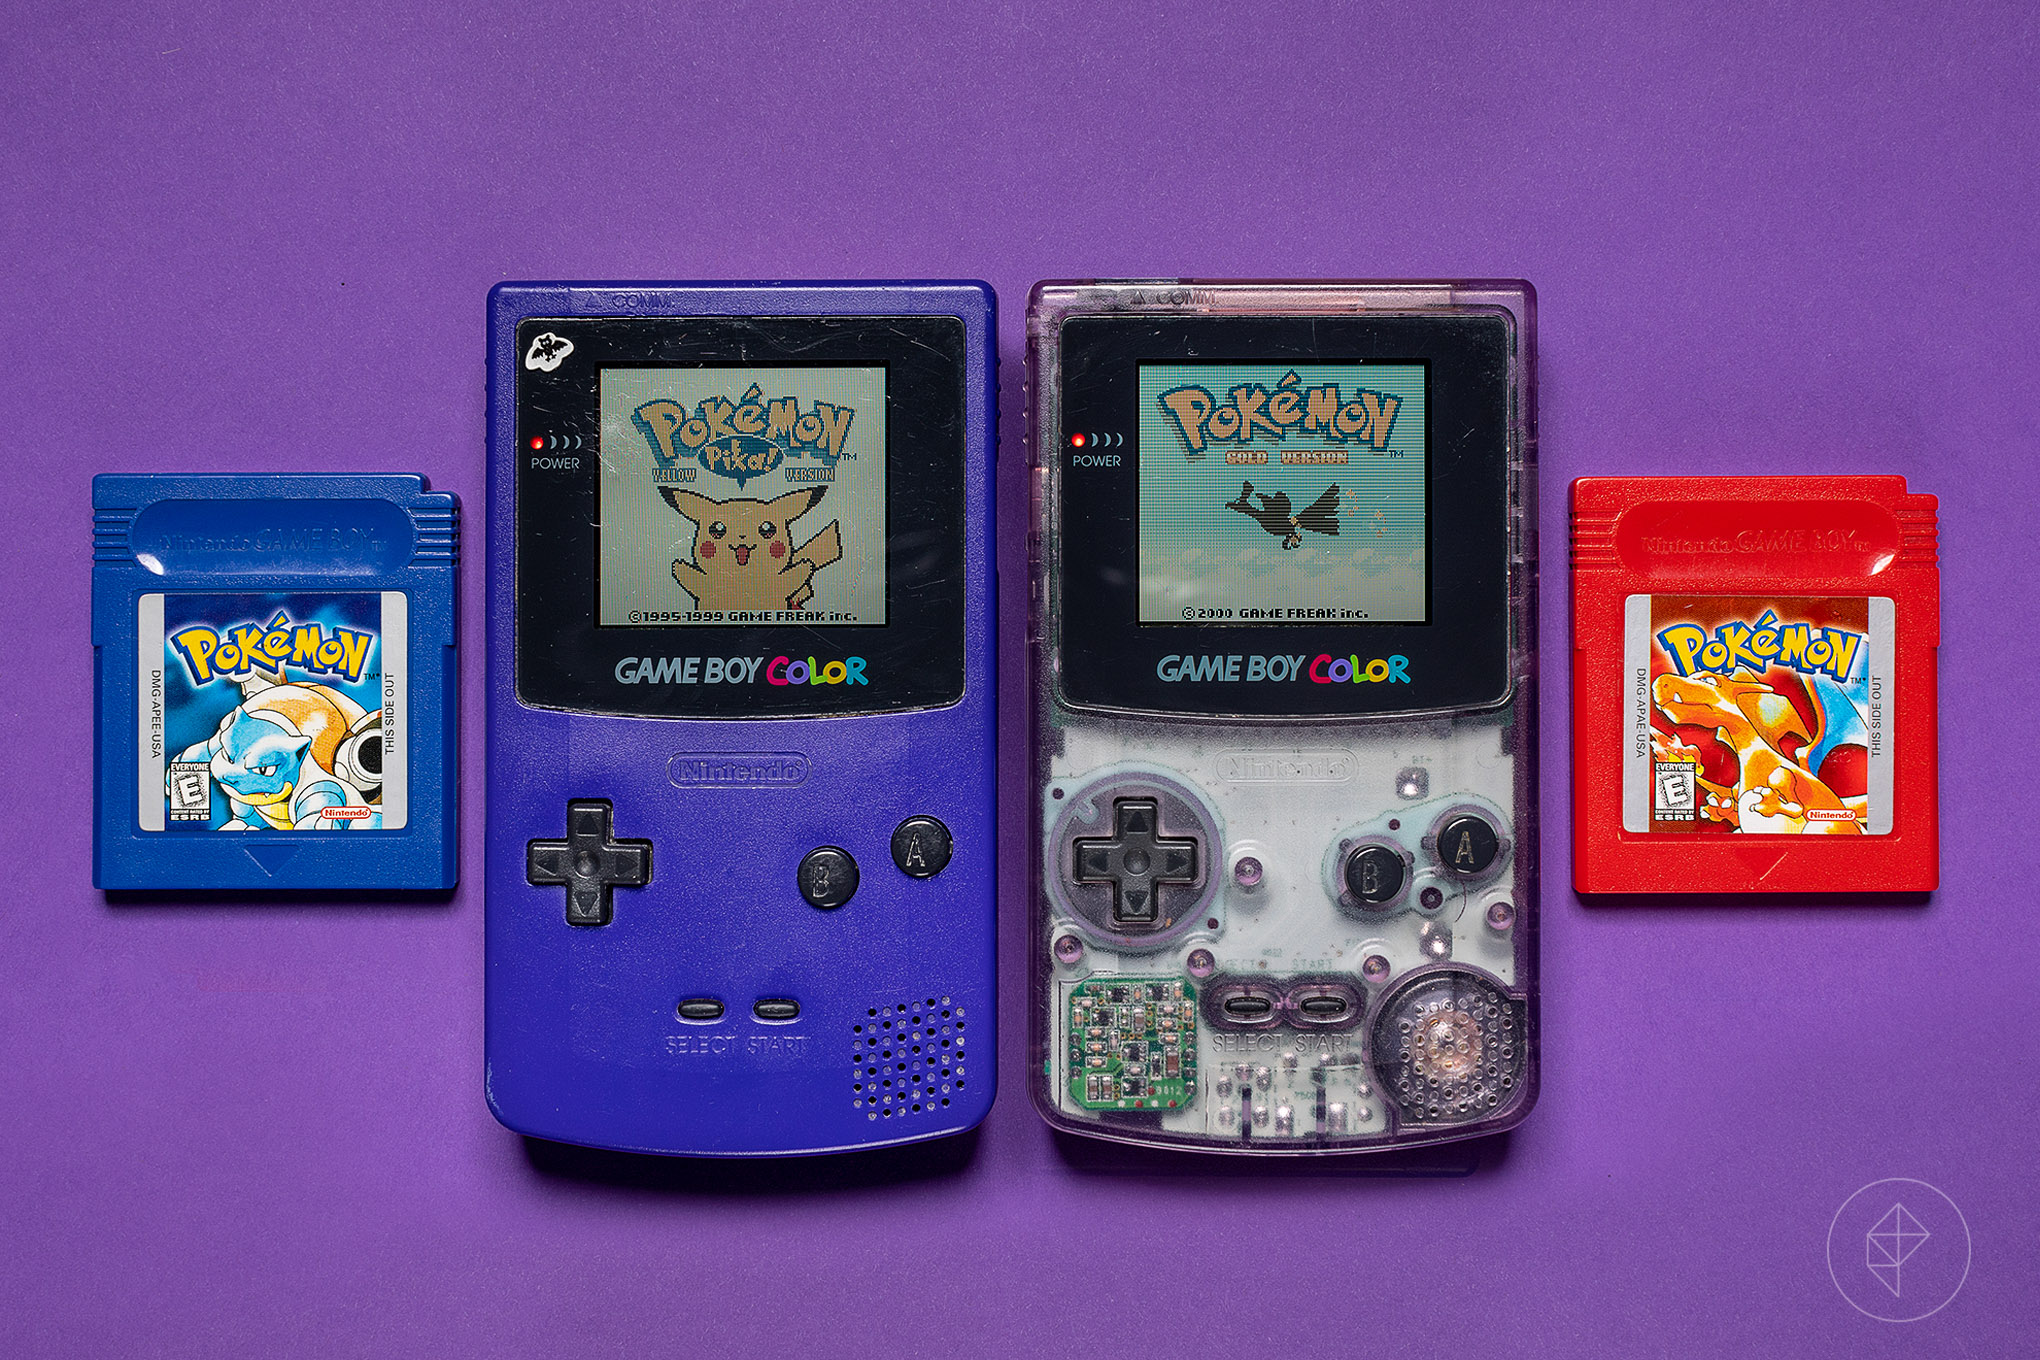 Pokémon: The 20-year fad